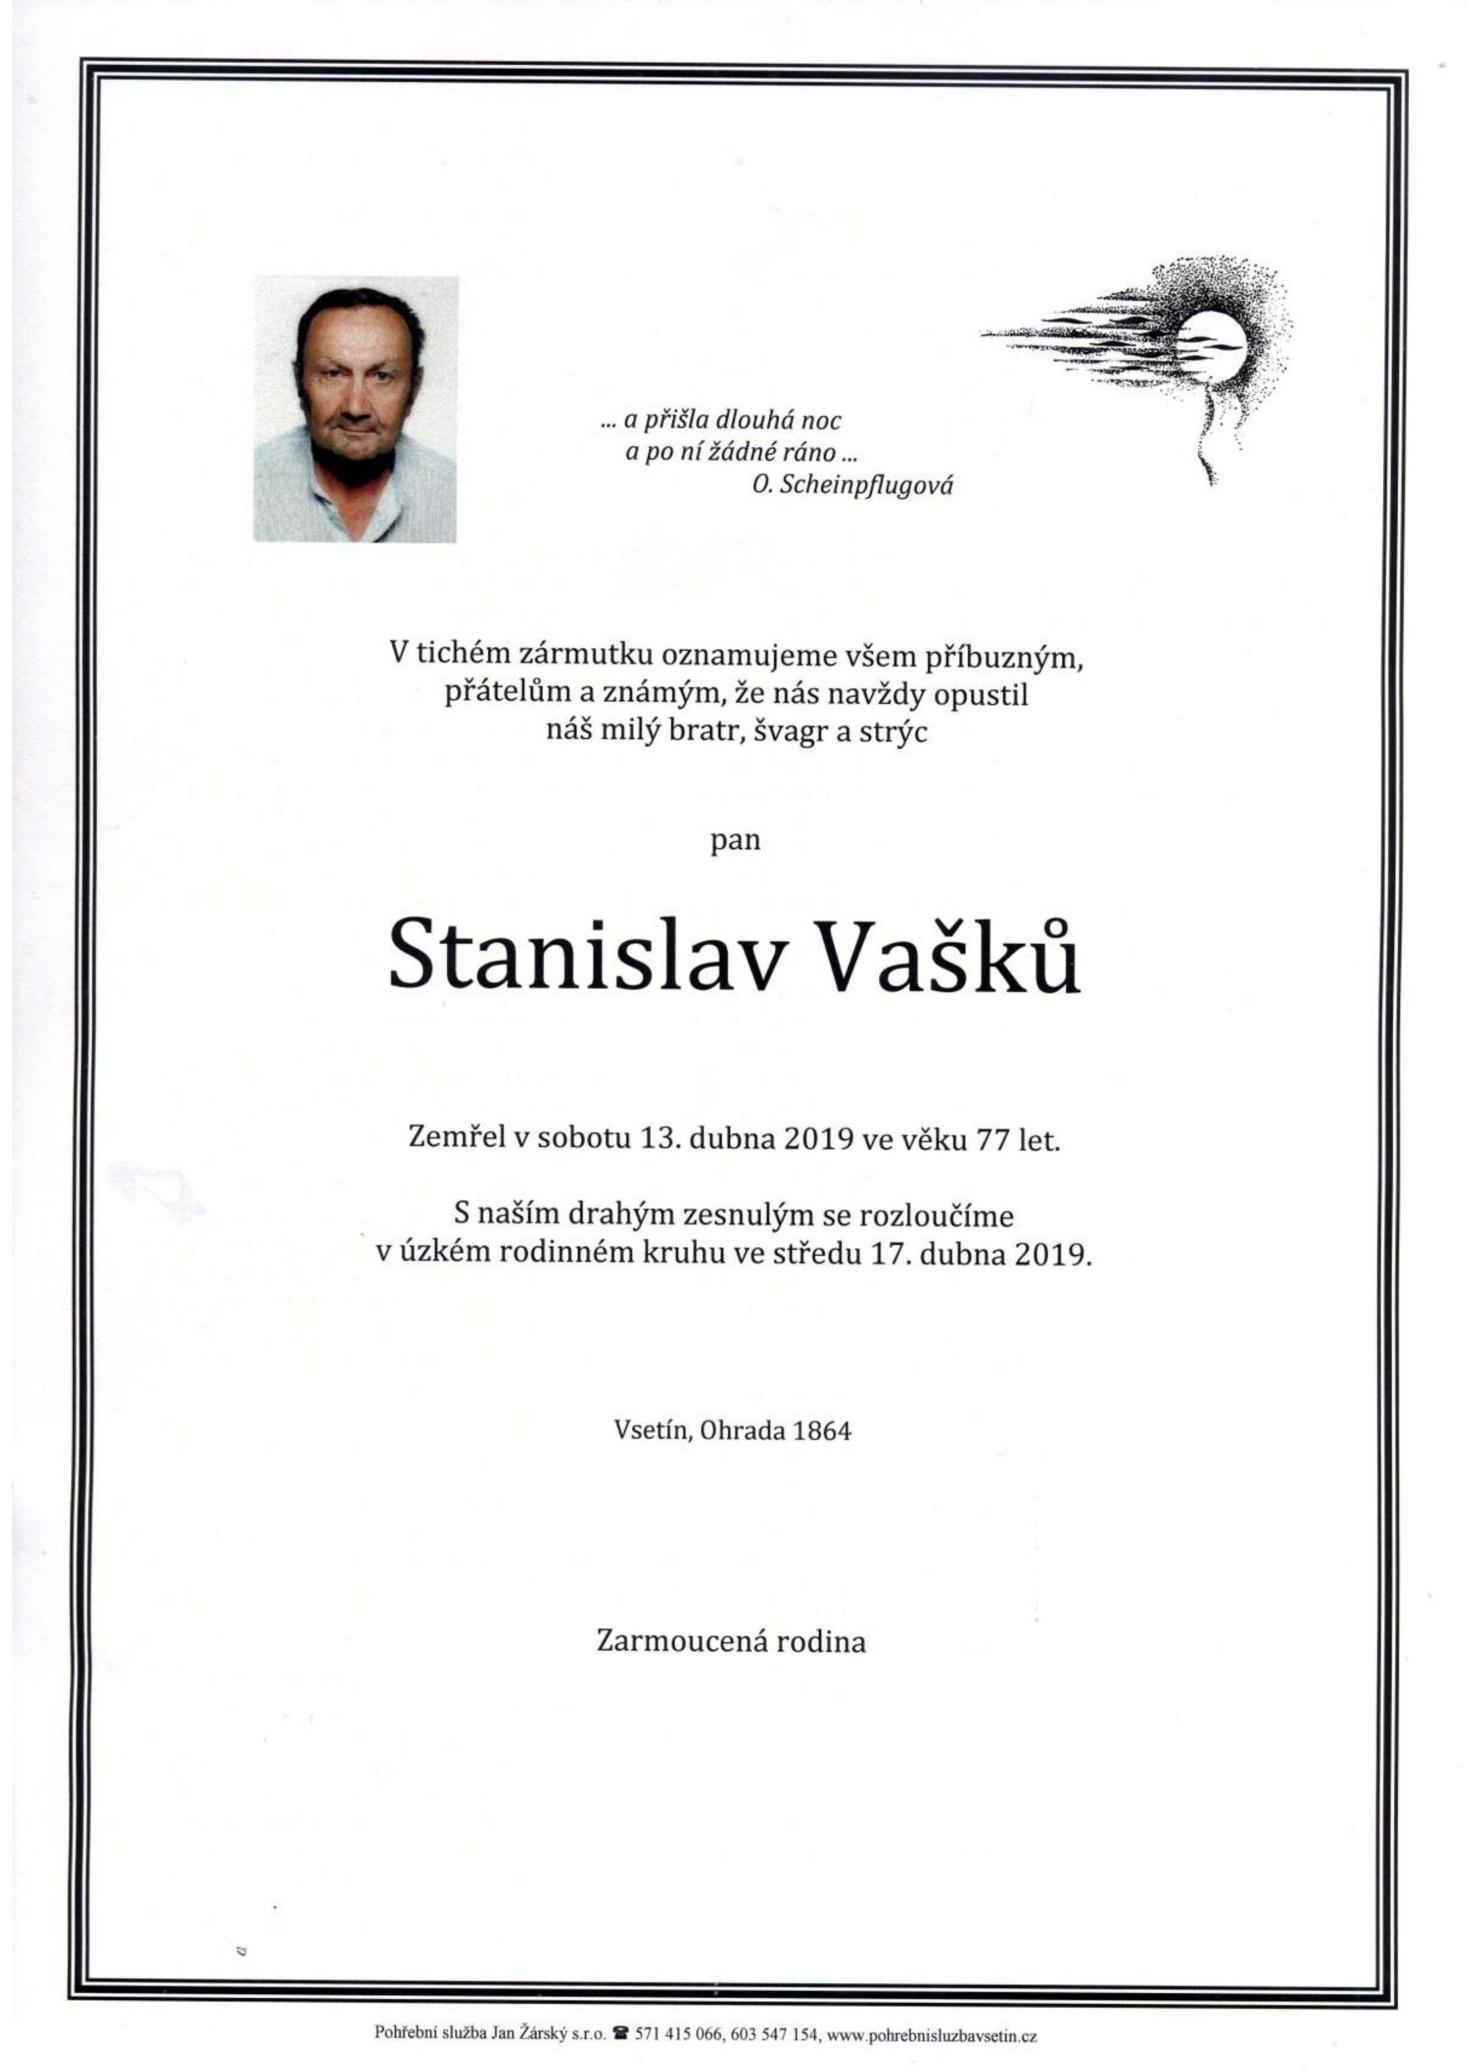 Stanislav Vašků